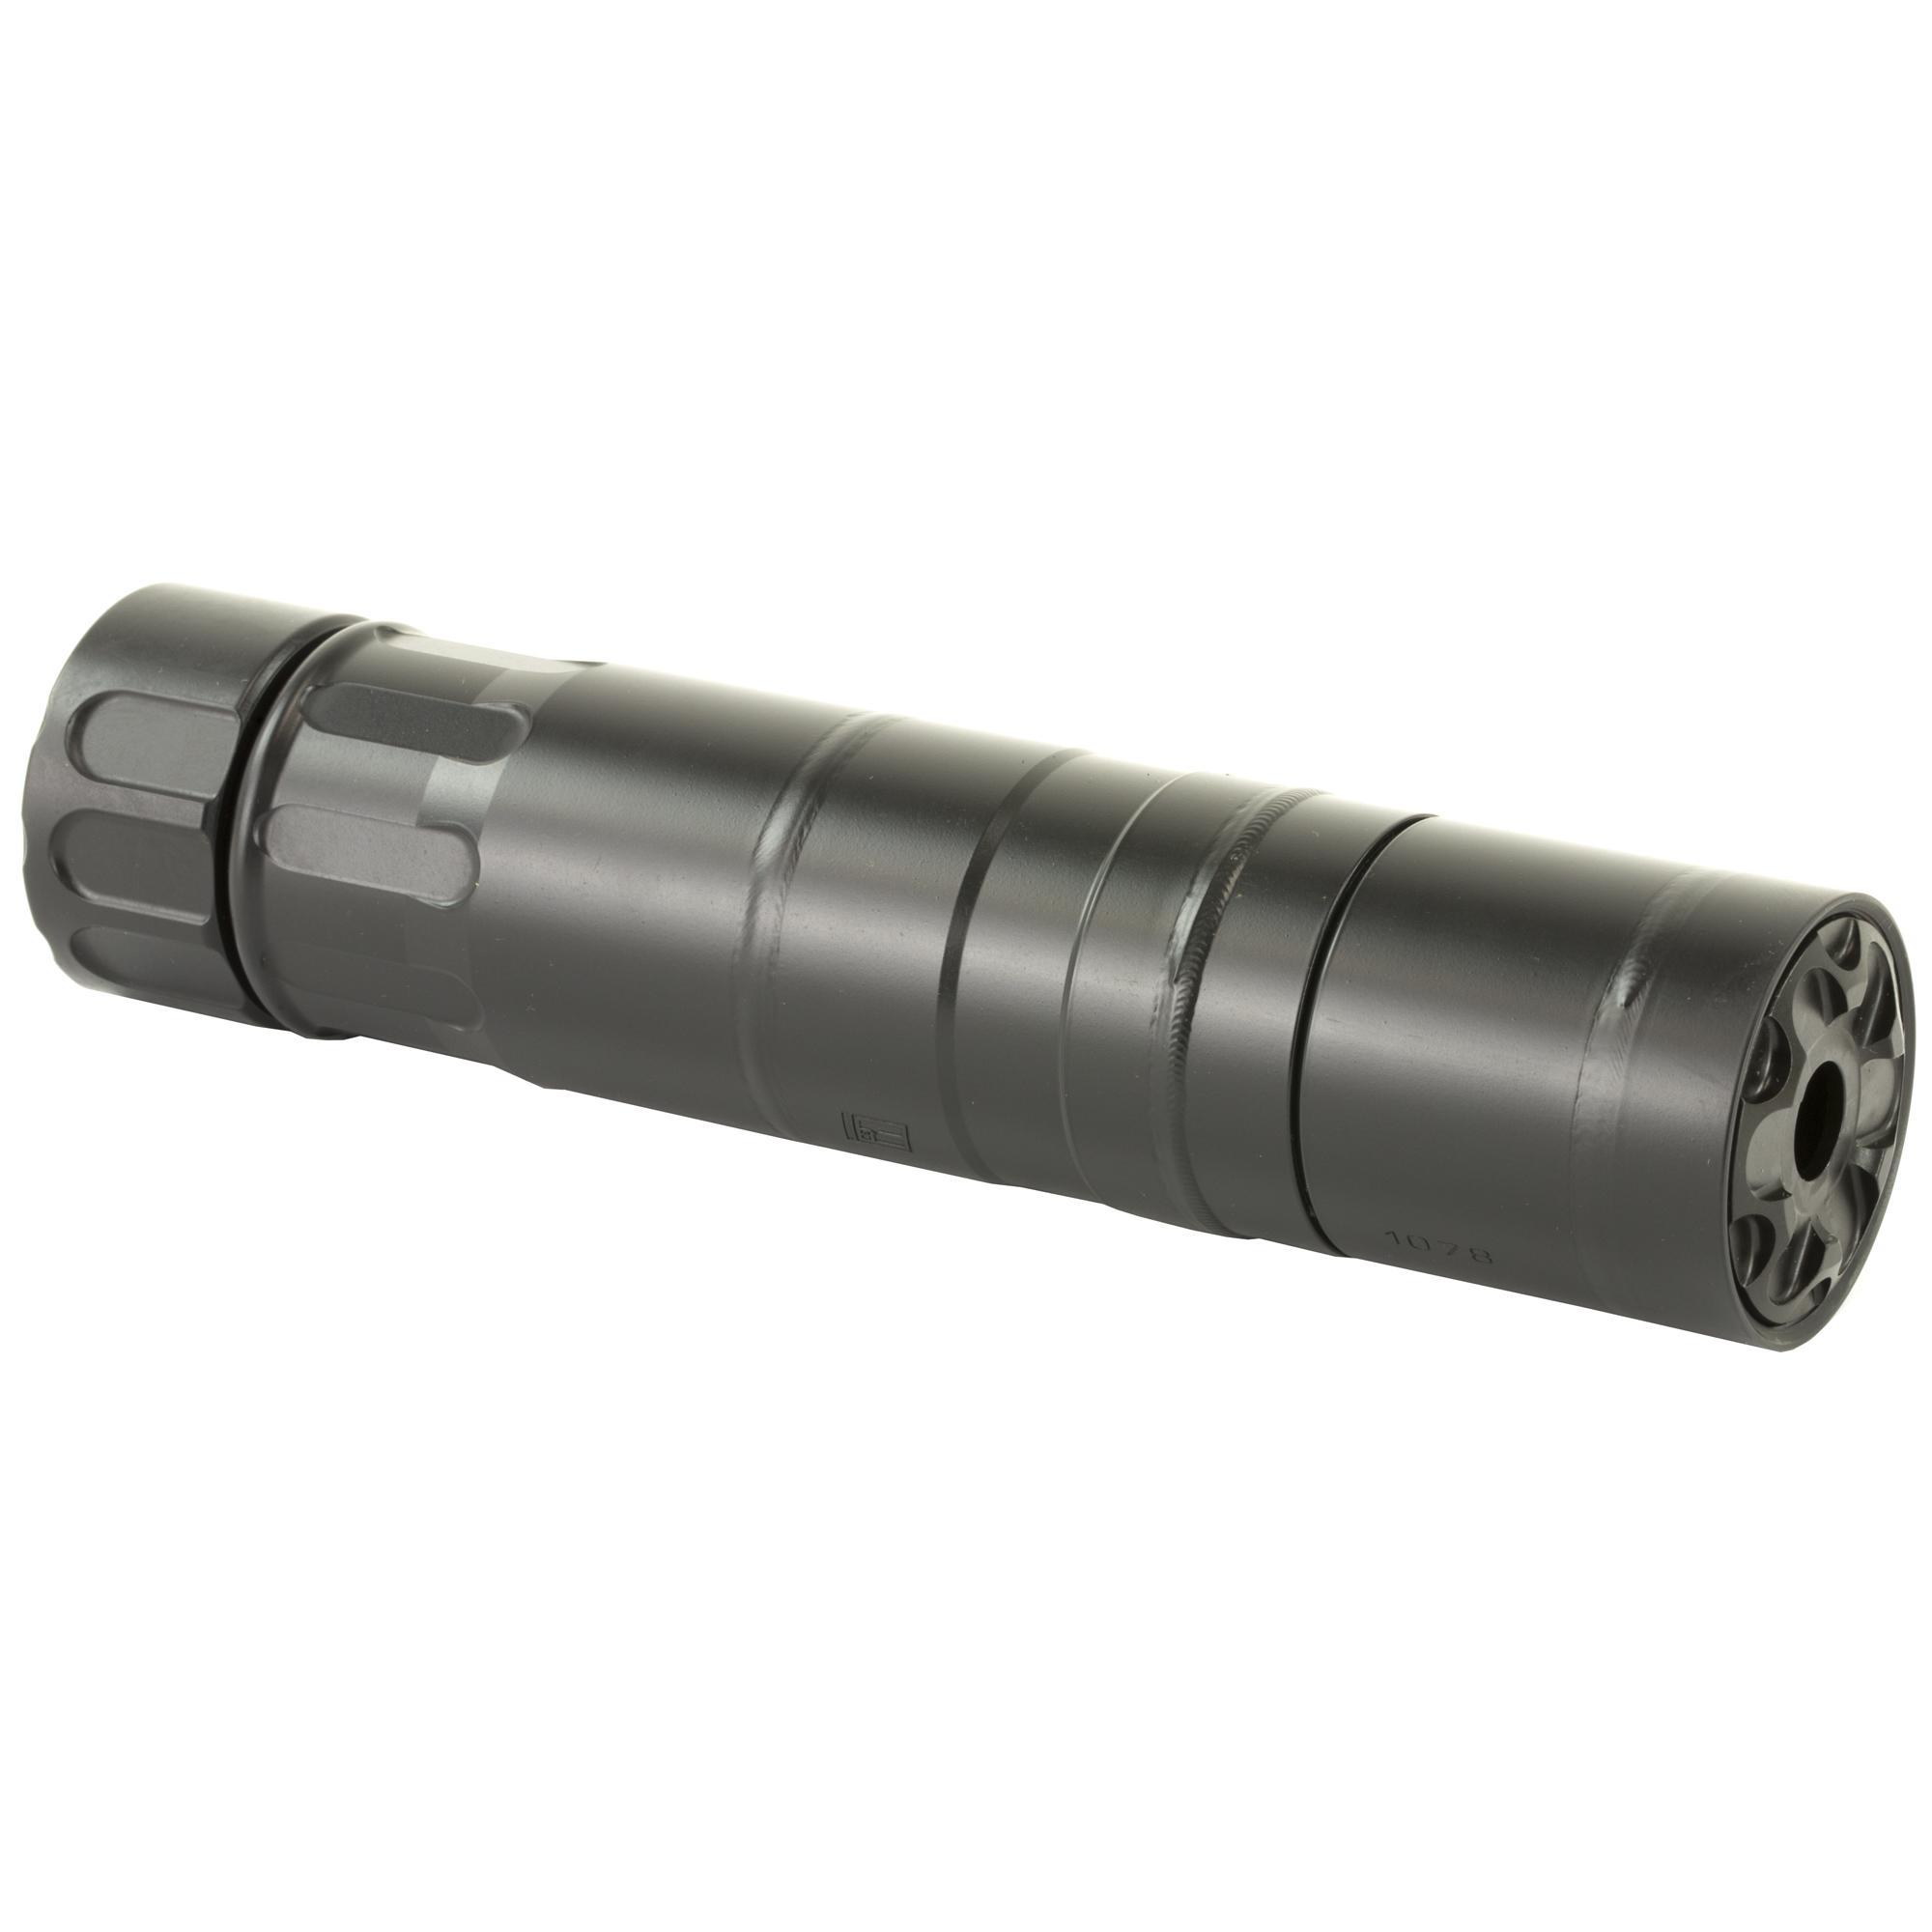 Rugged Suppressors Rugged Micro30 762 Suppressor